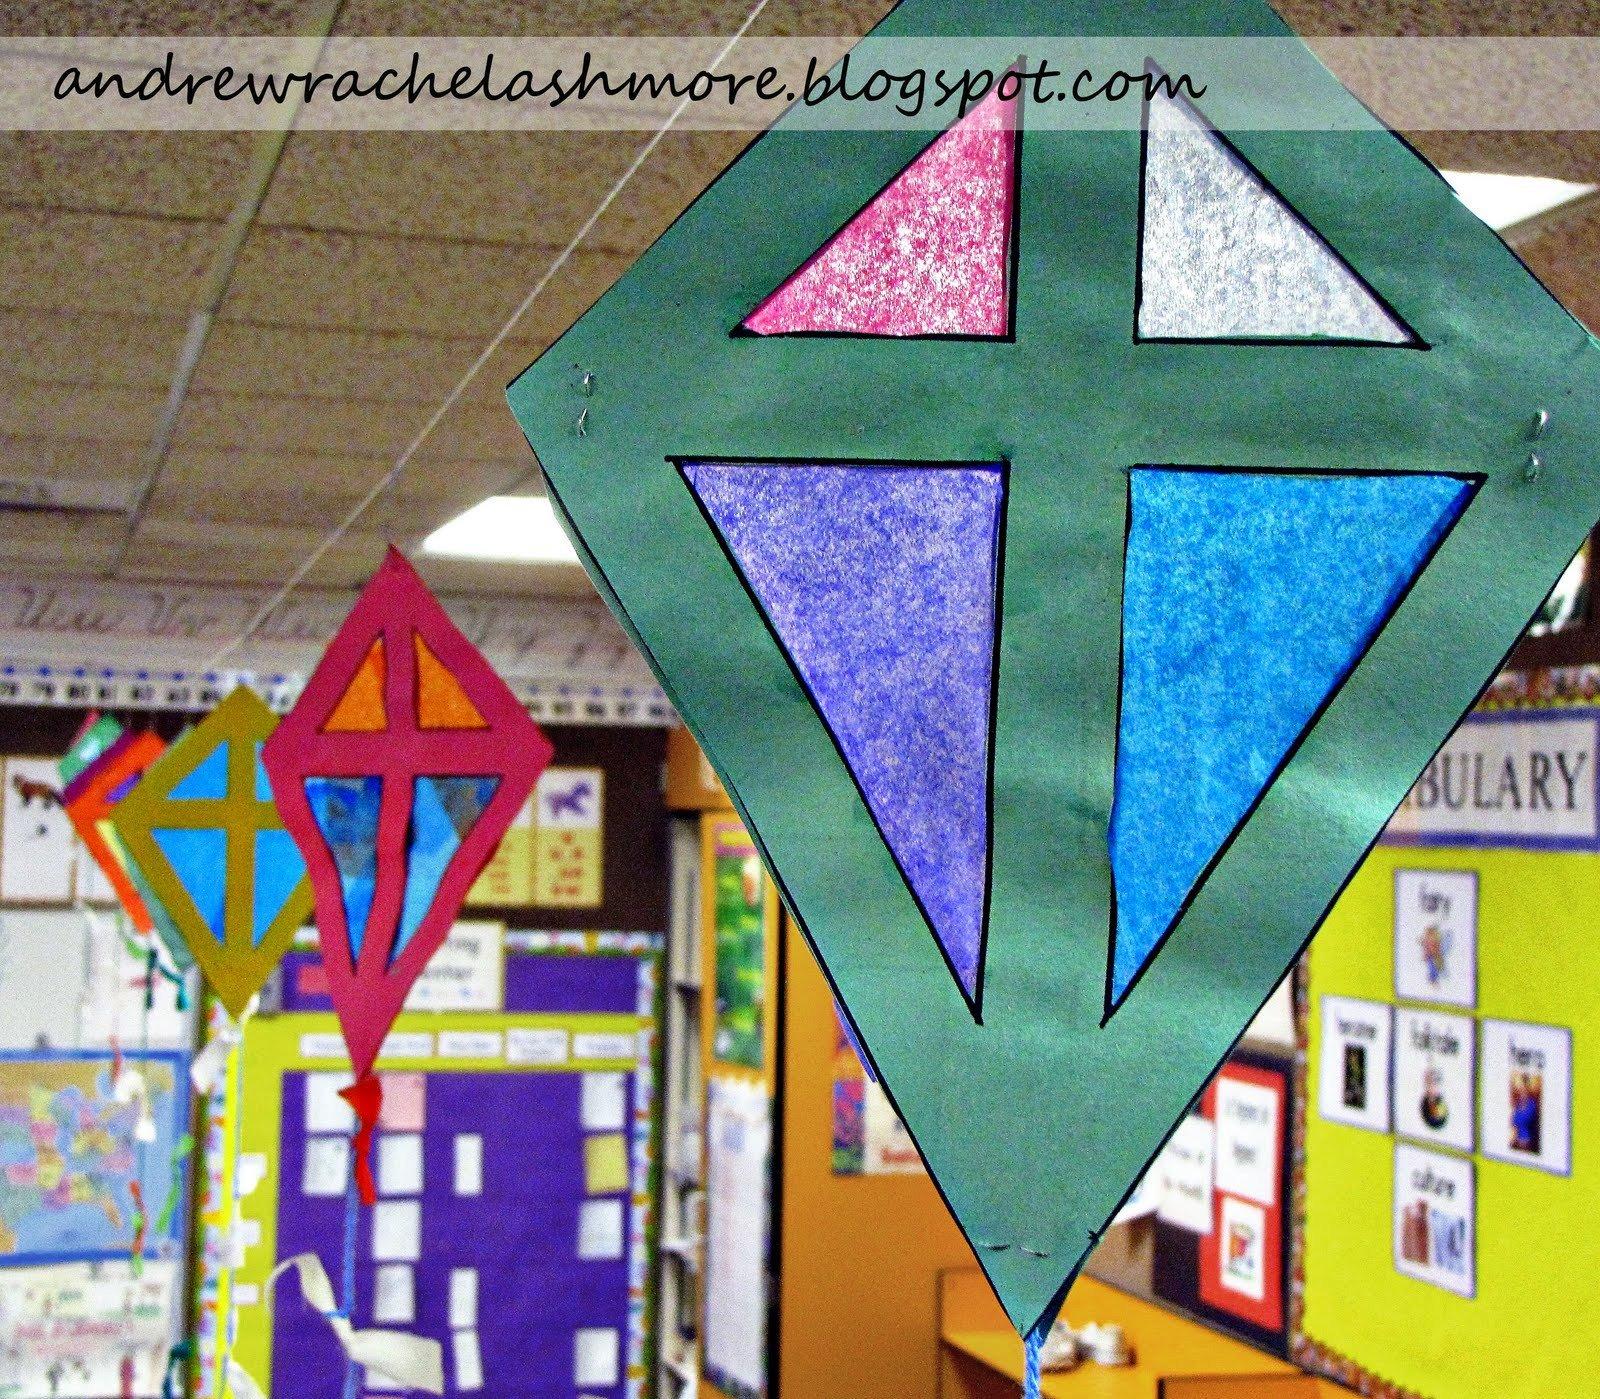 Small Kite Template Our Small town Idaho Life Kid S Kite Craft Tutorial Free